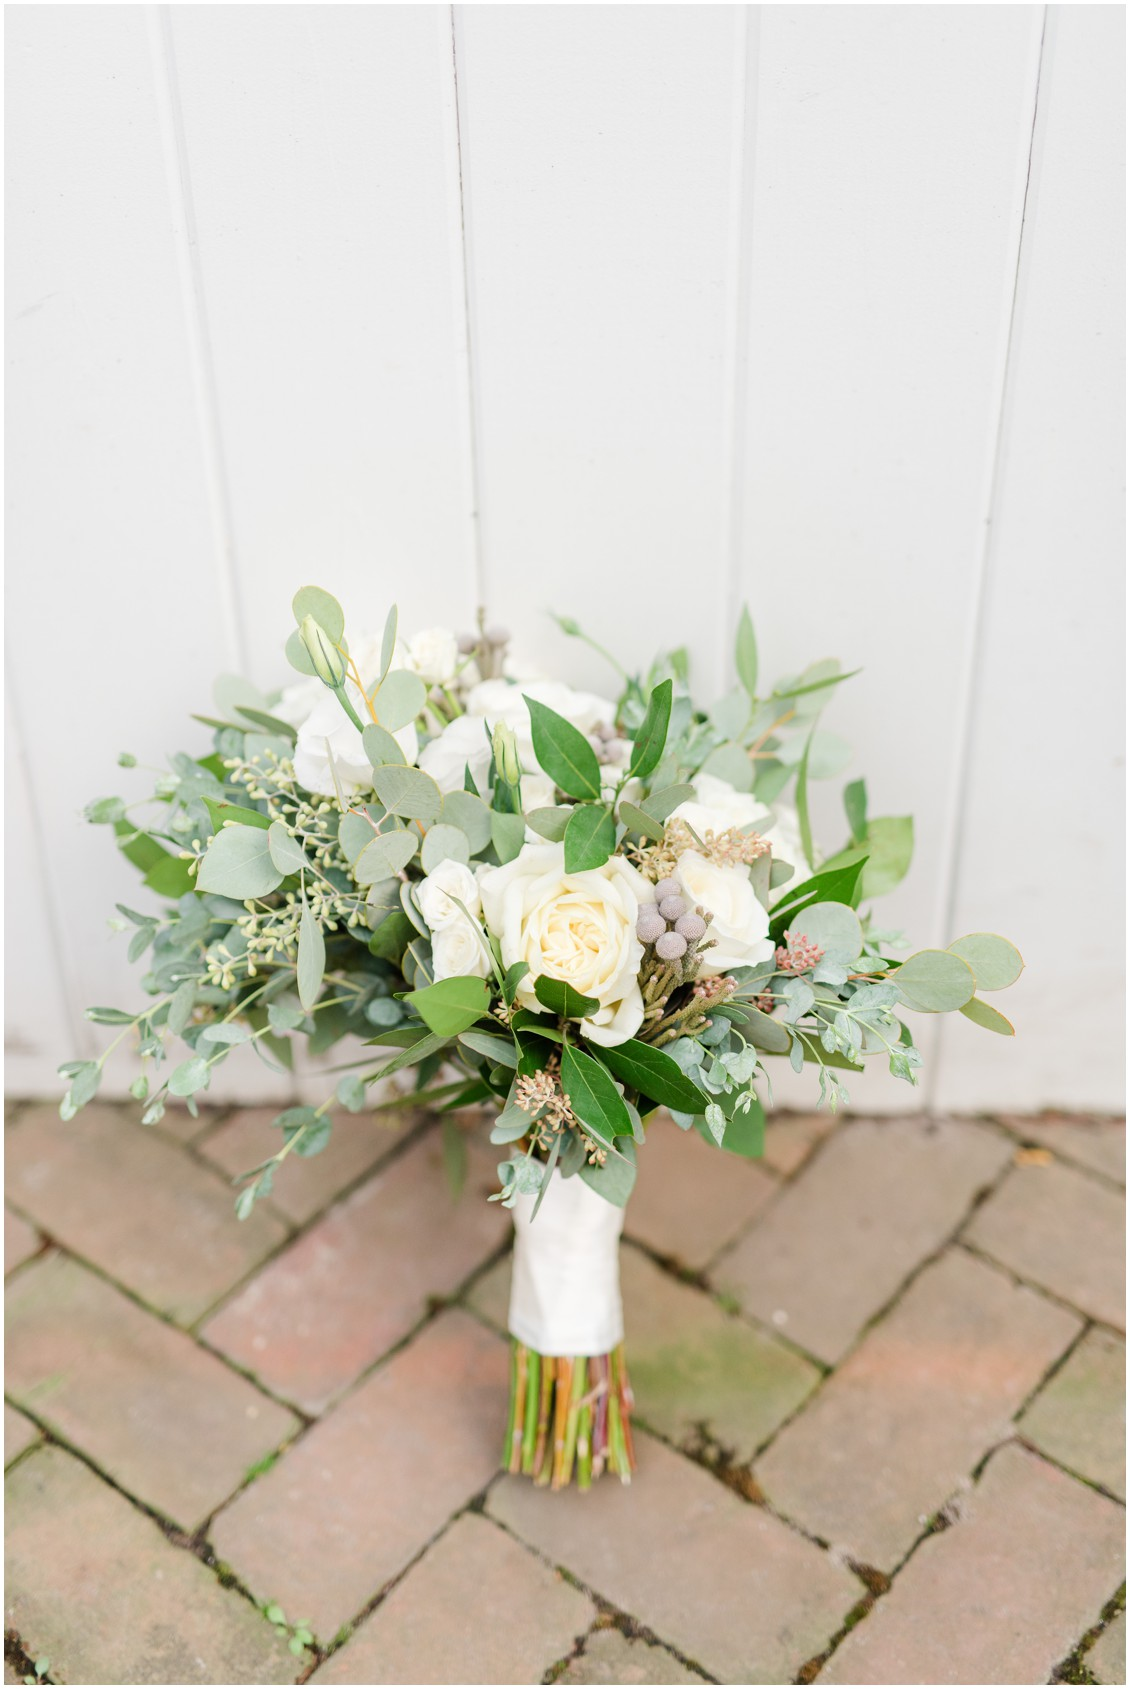 Bridal bouquet detail shot on brick walkway | My Eastern Shore Wedding | The Tidewater Inn